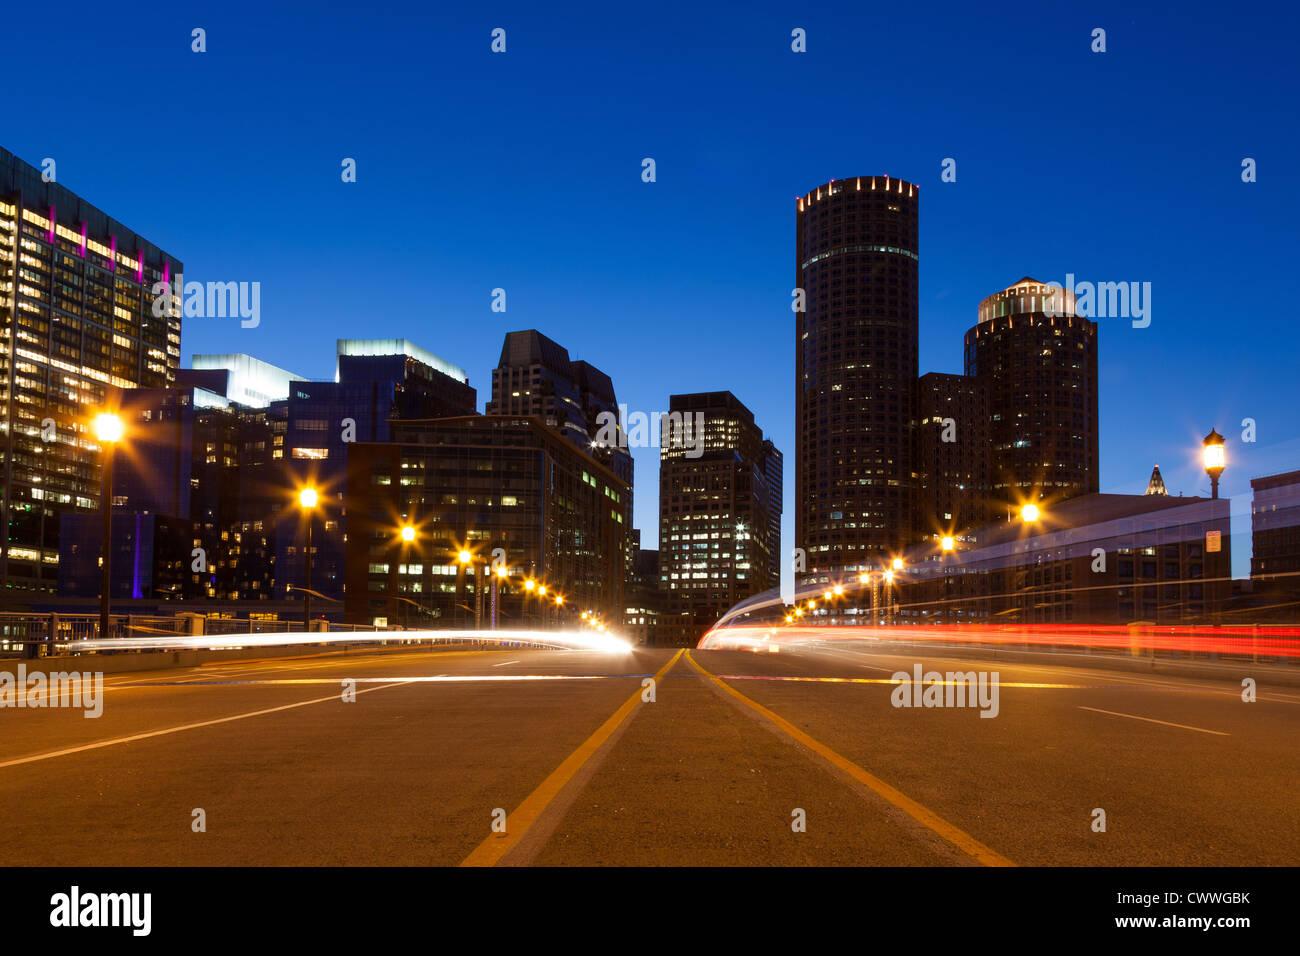 Por la noche las calles de Boston, Massachusetts, EE.UU. Imagen De Stock